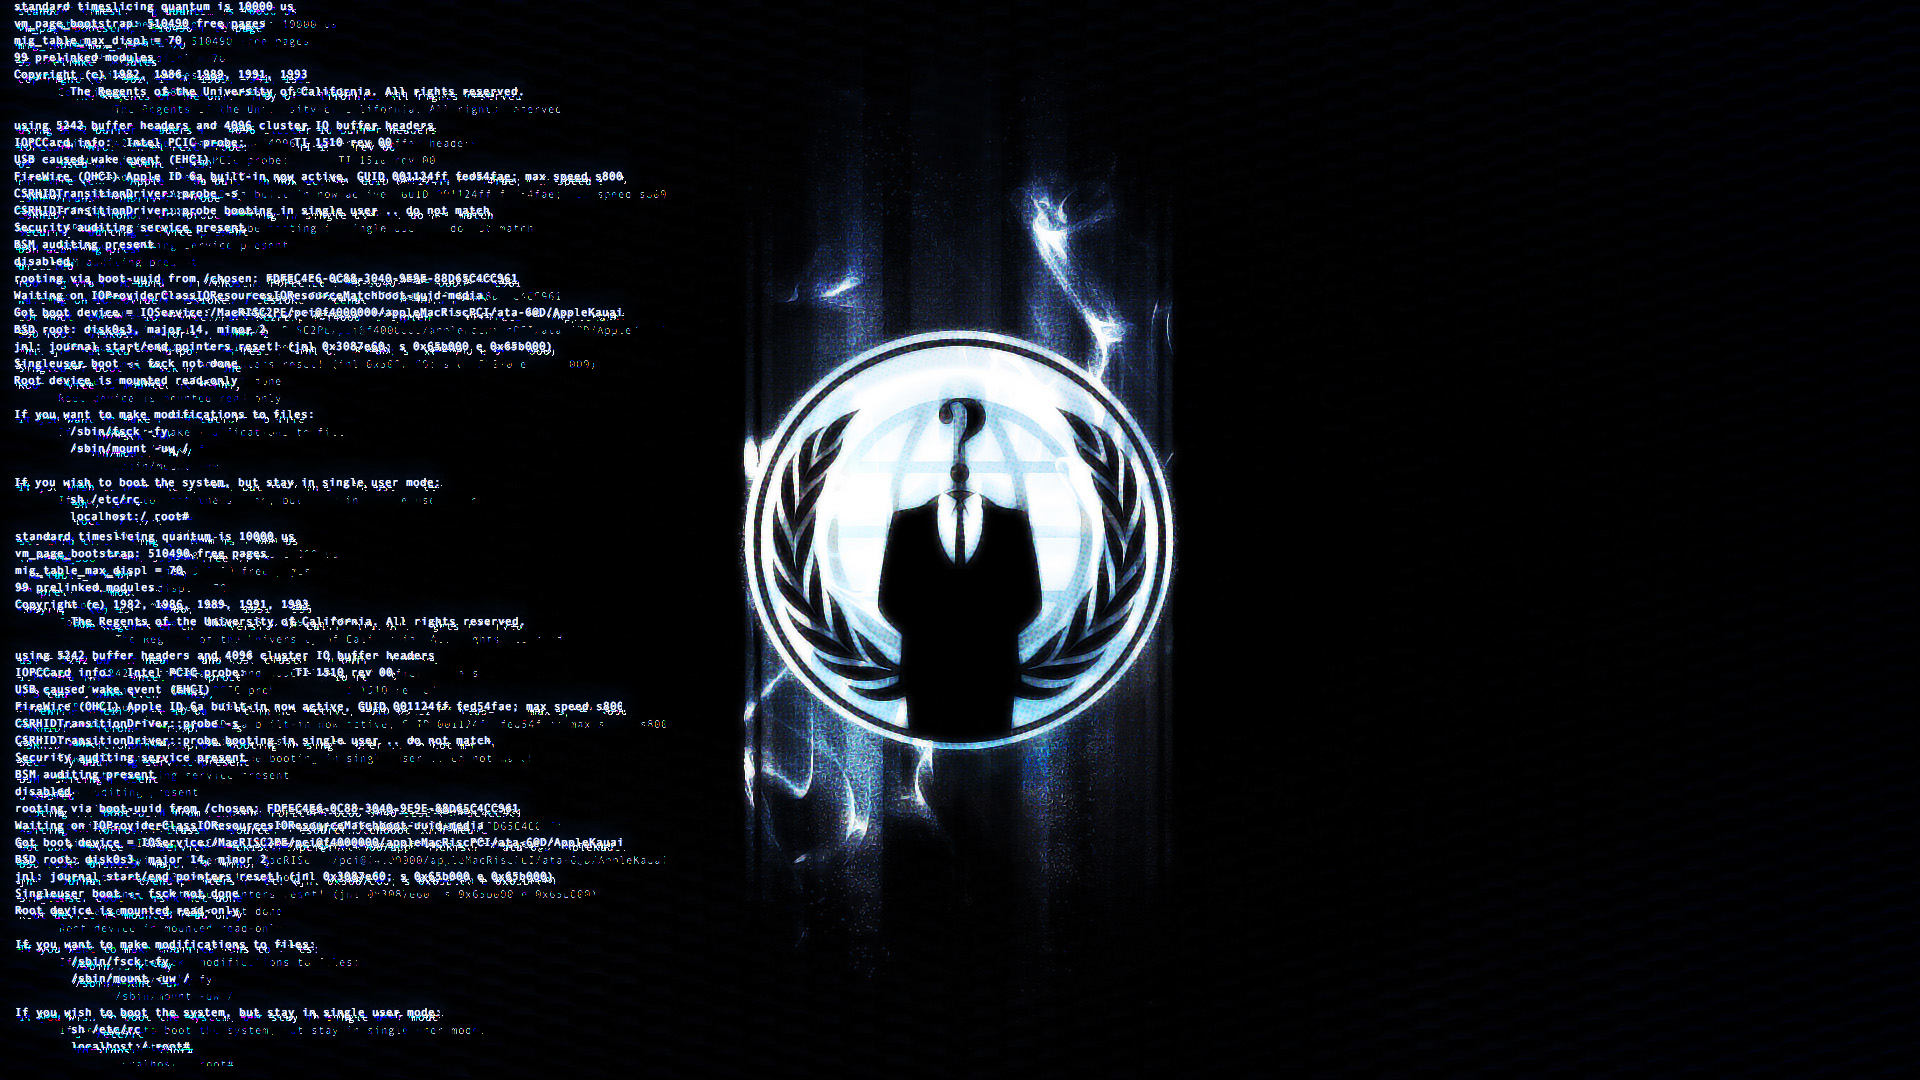 hacker wallpaper 1920x1080 - photo #8